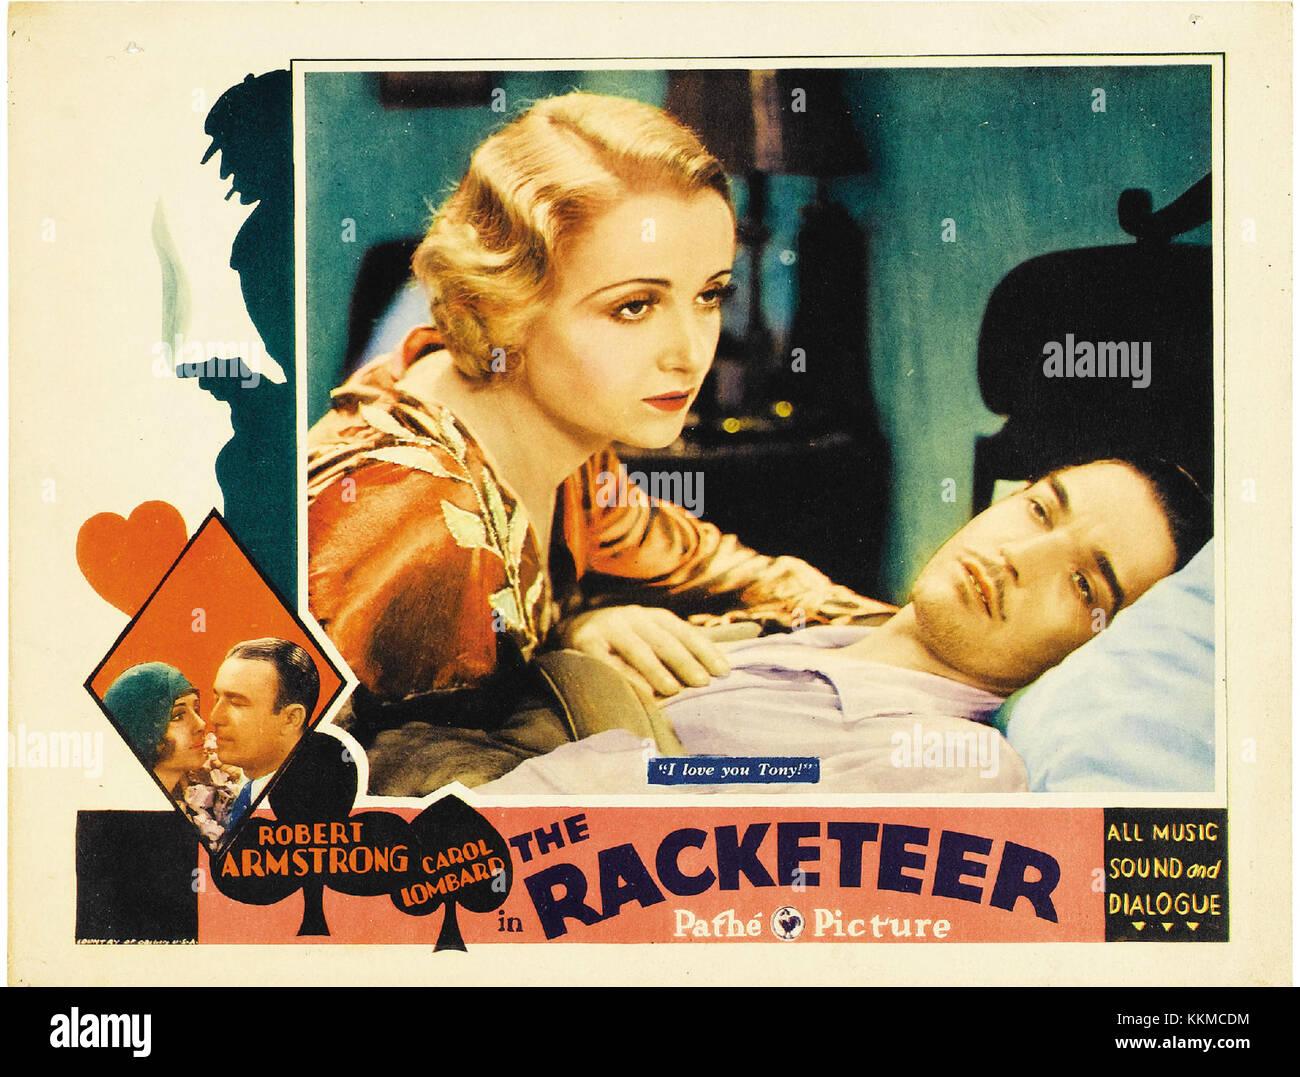 Racketeer lobby card - Stock Image